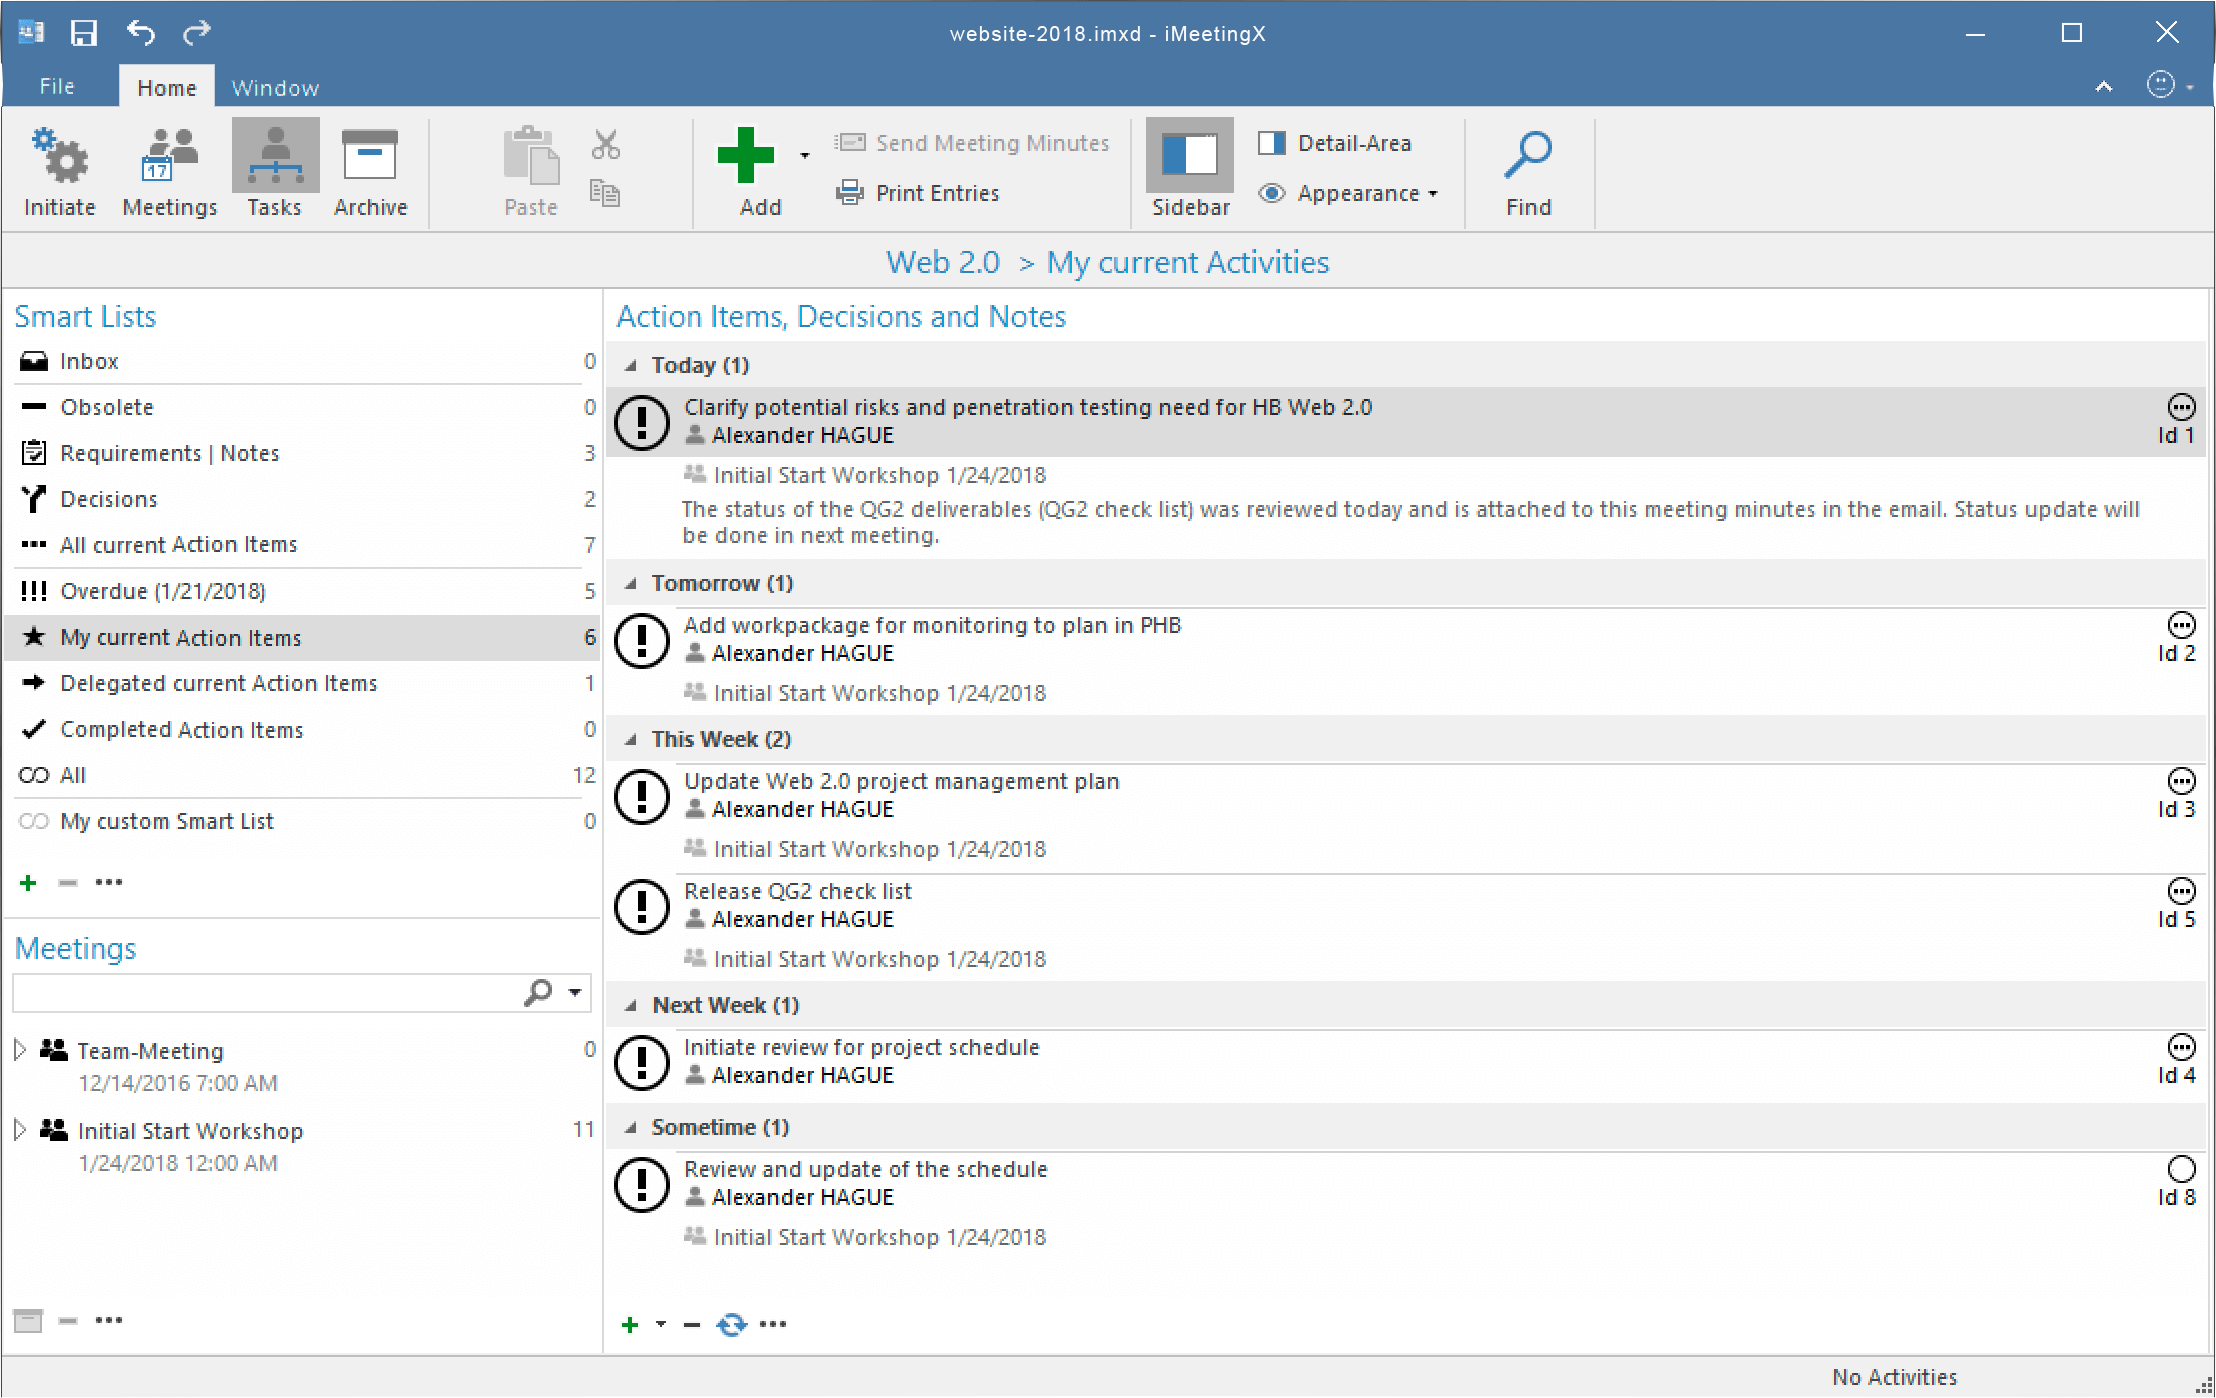 iMeetingX Screenshot